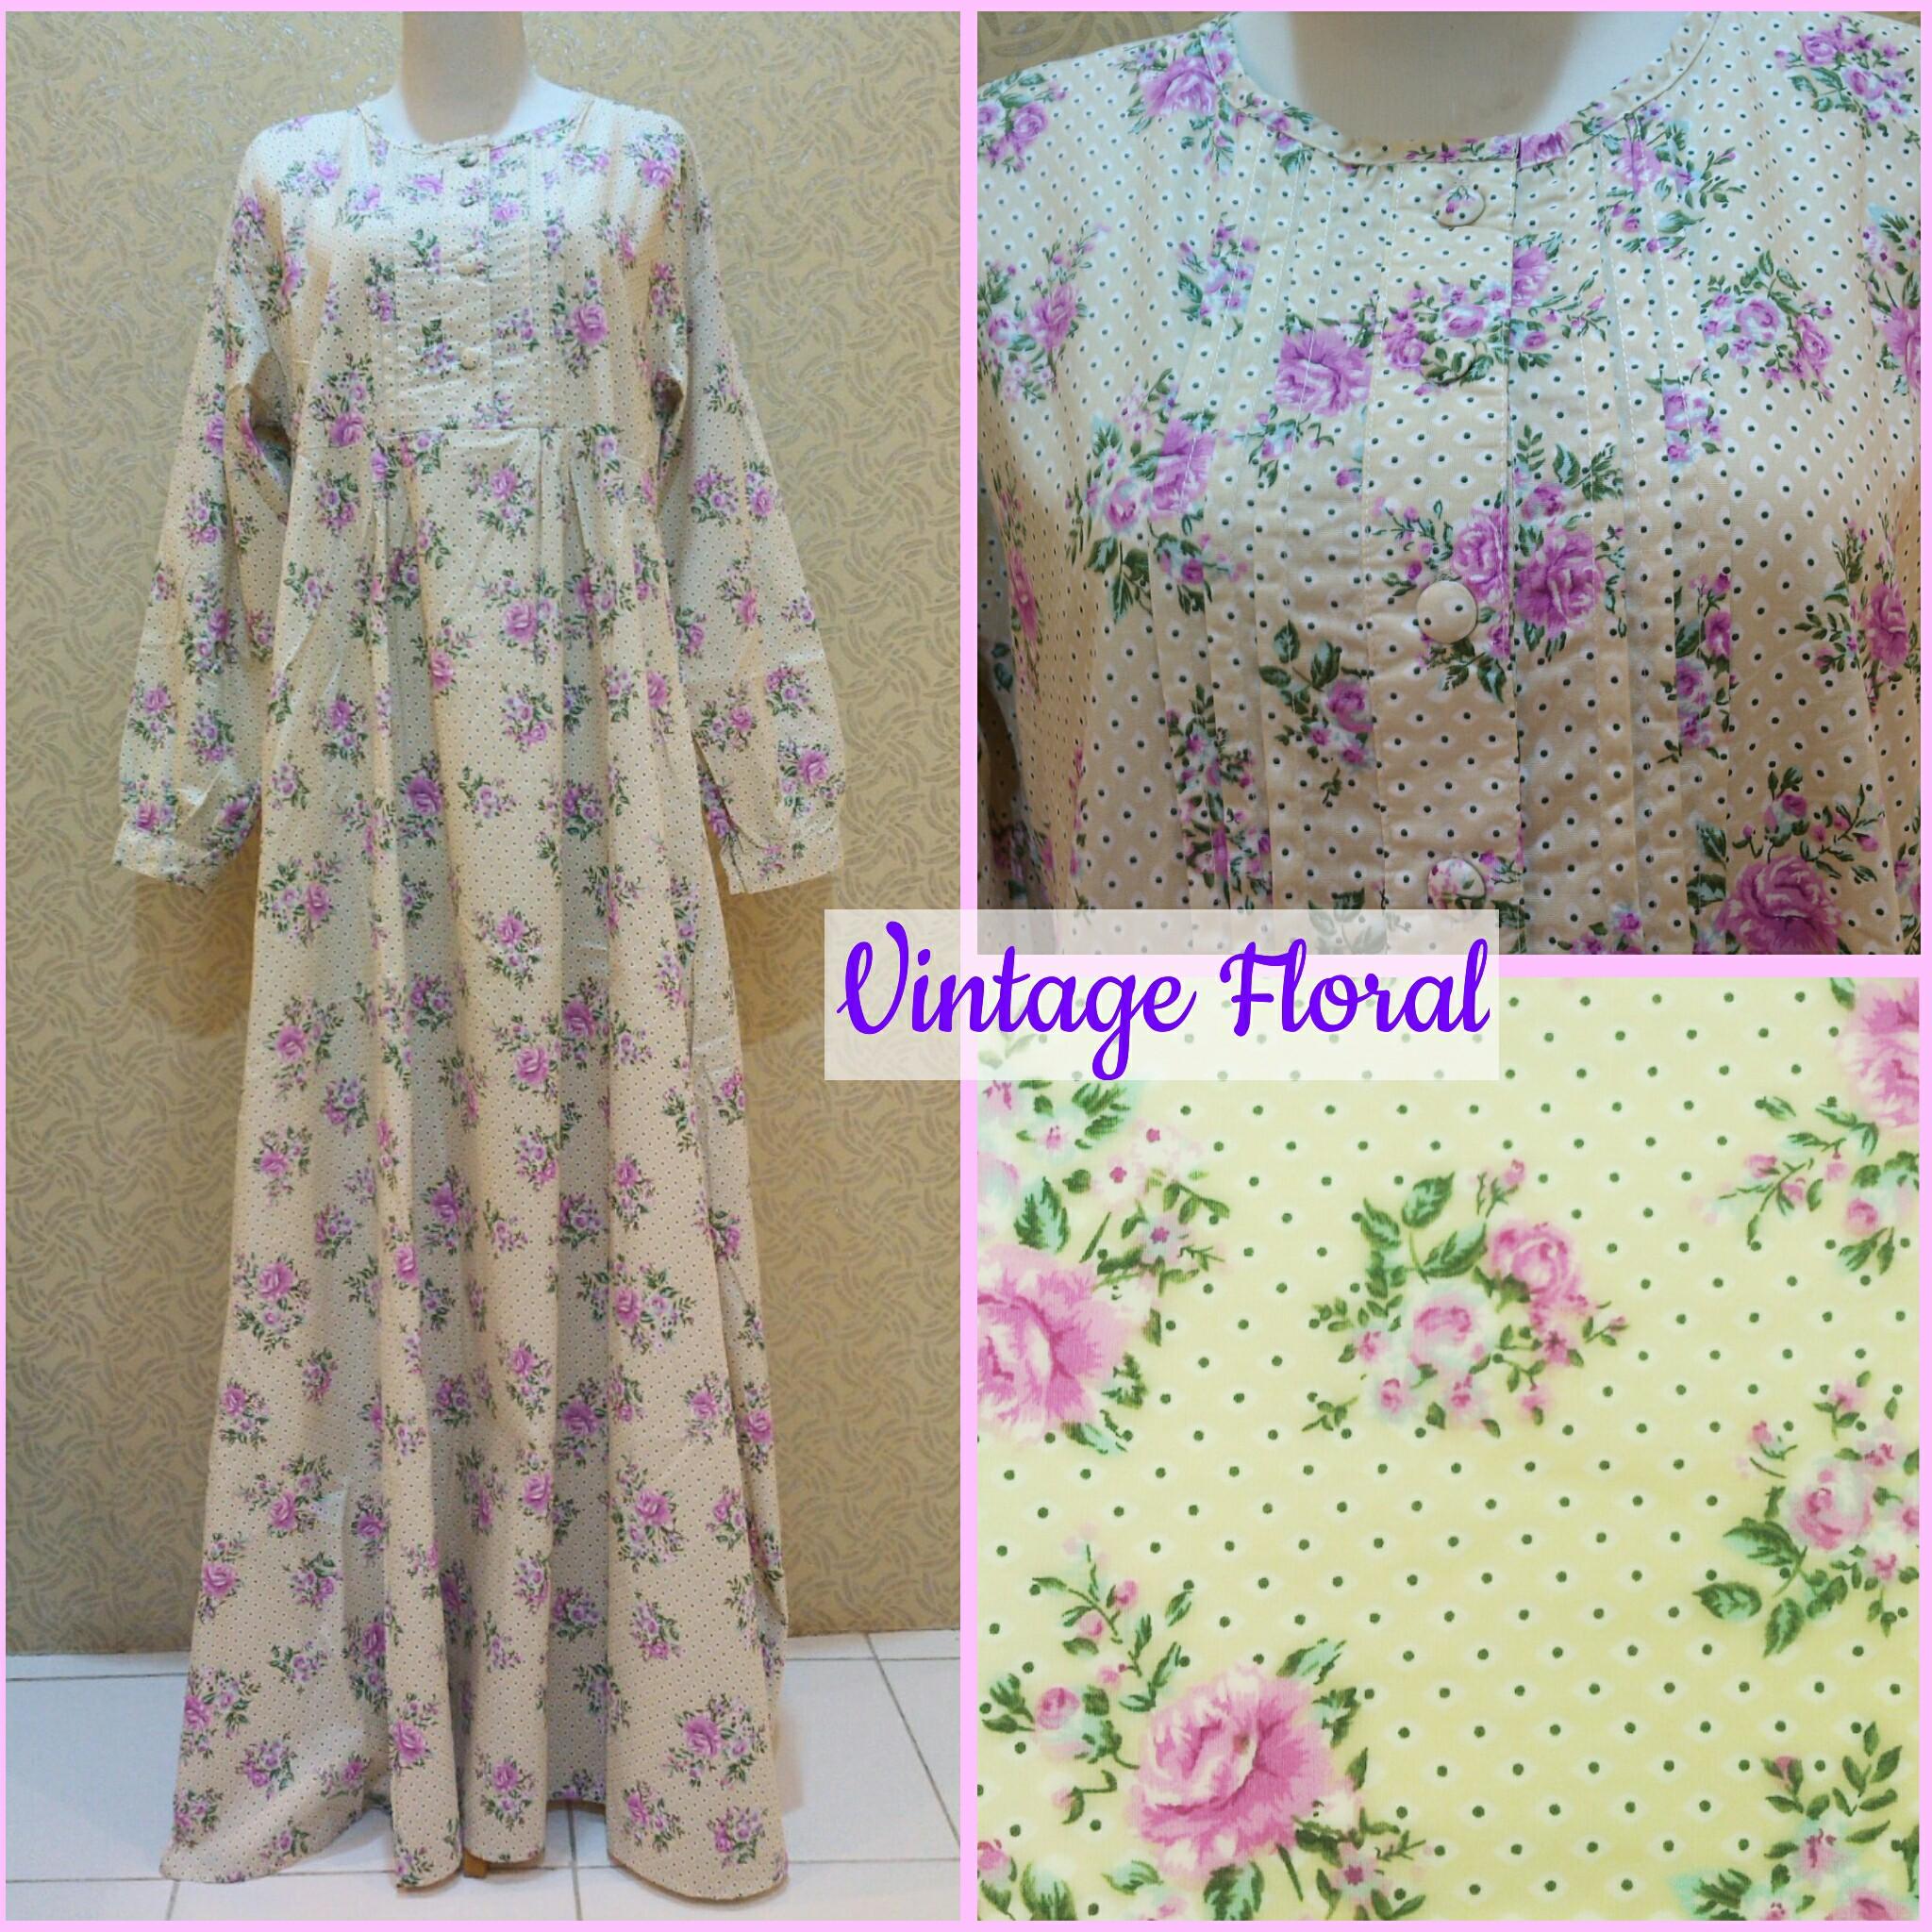 Jual Gamis Katun Jepang Vintage Floral Delonix Hijab